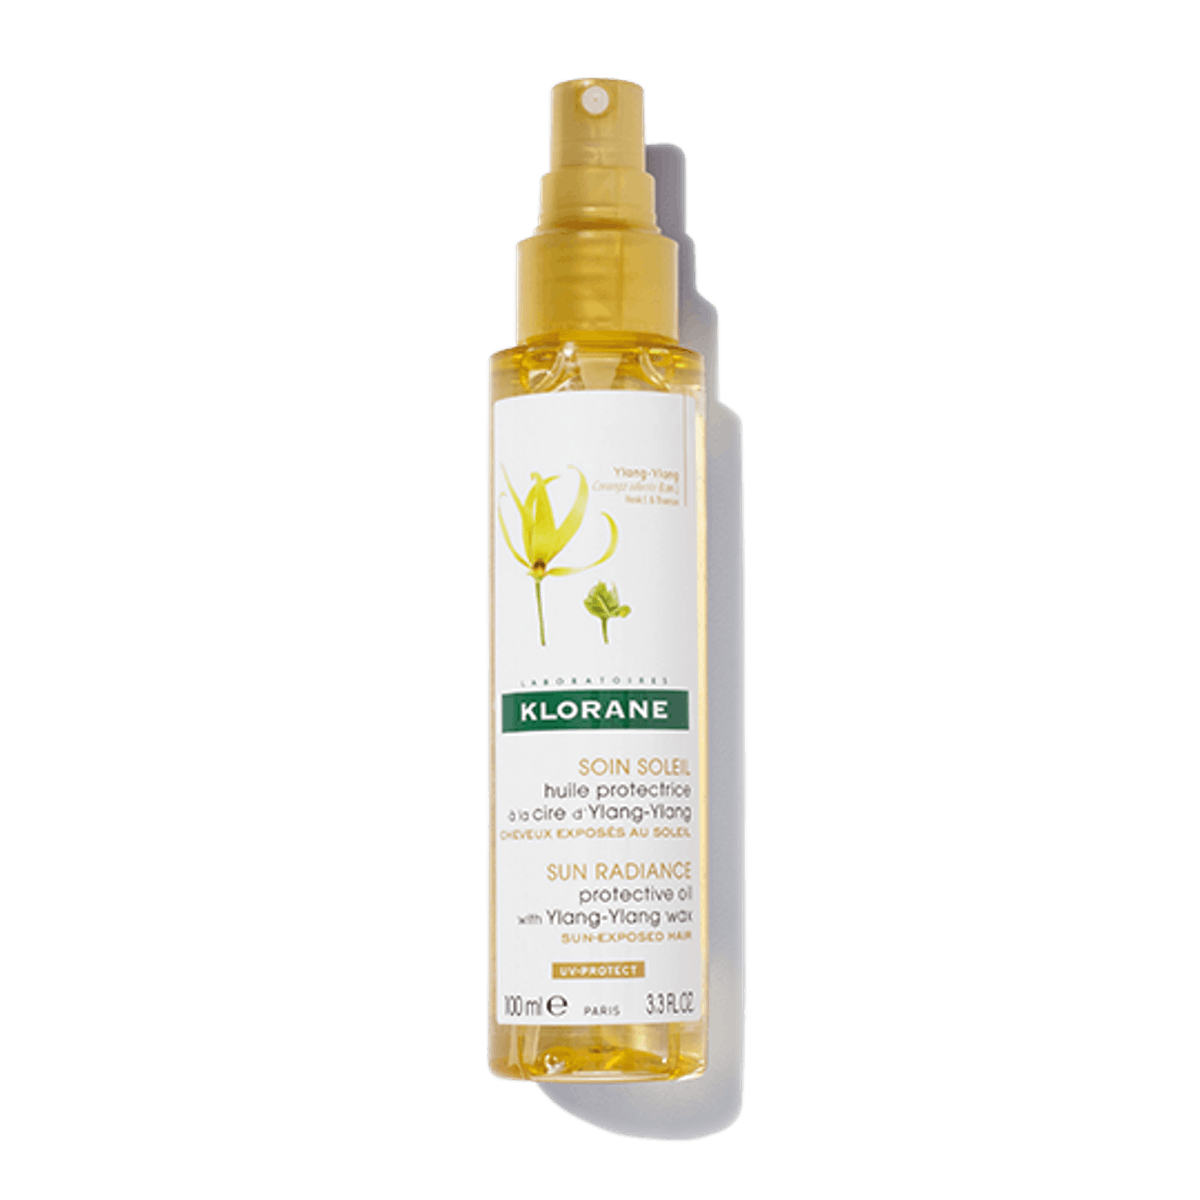 Klorane Protective Oil With Ylang-Ylang Wax